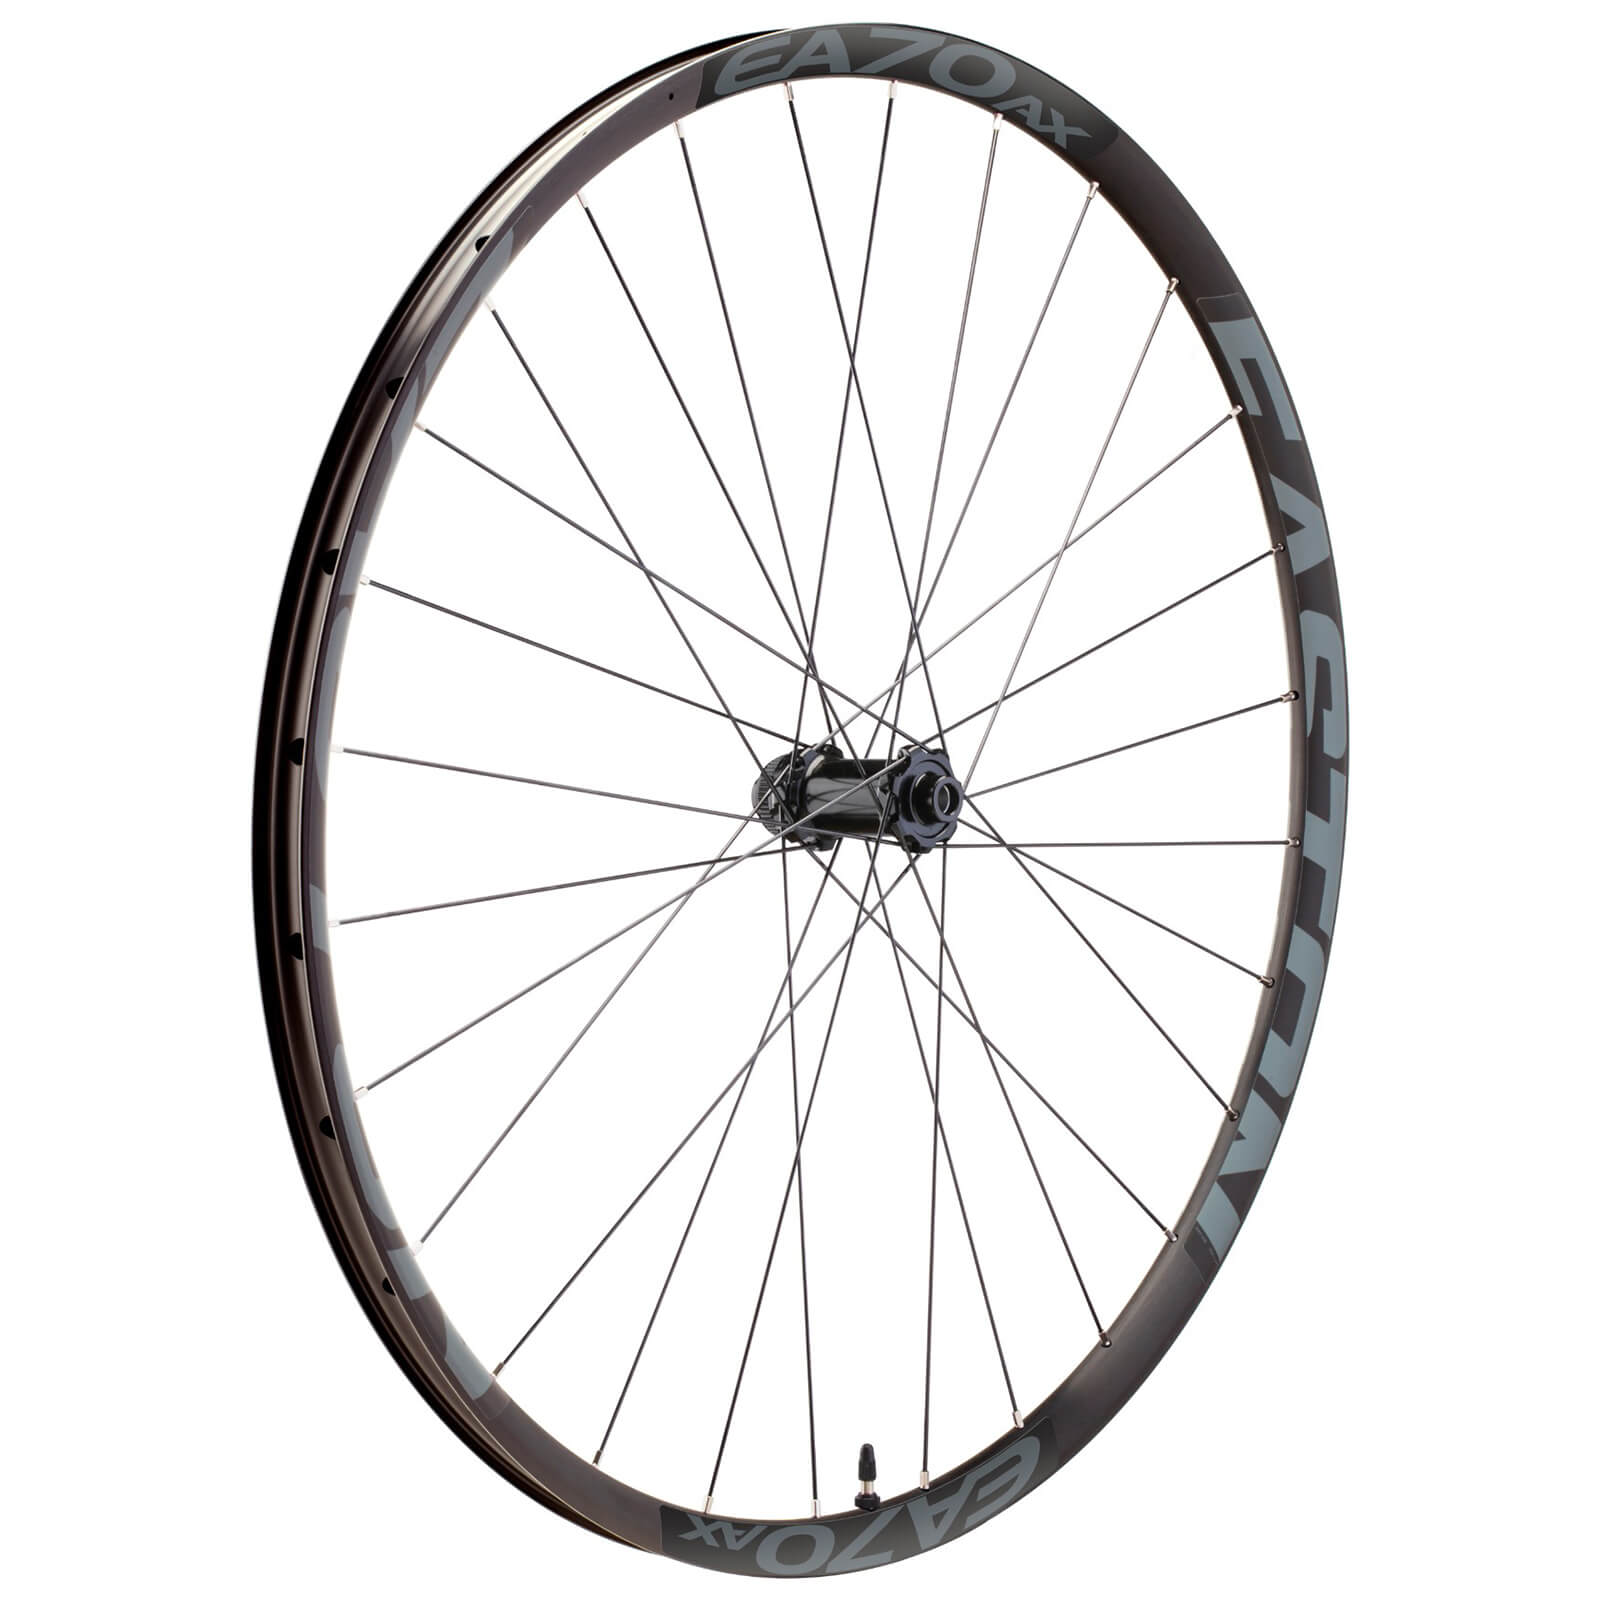 Easton Ea90 Ax Clincher Disc Front Wheel - 700c